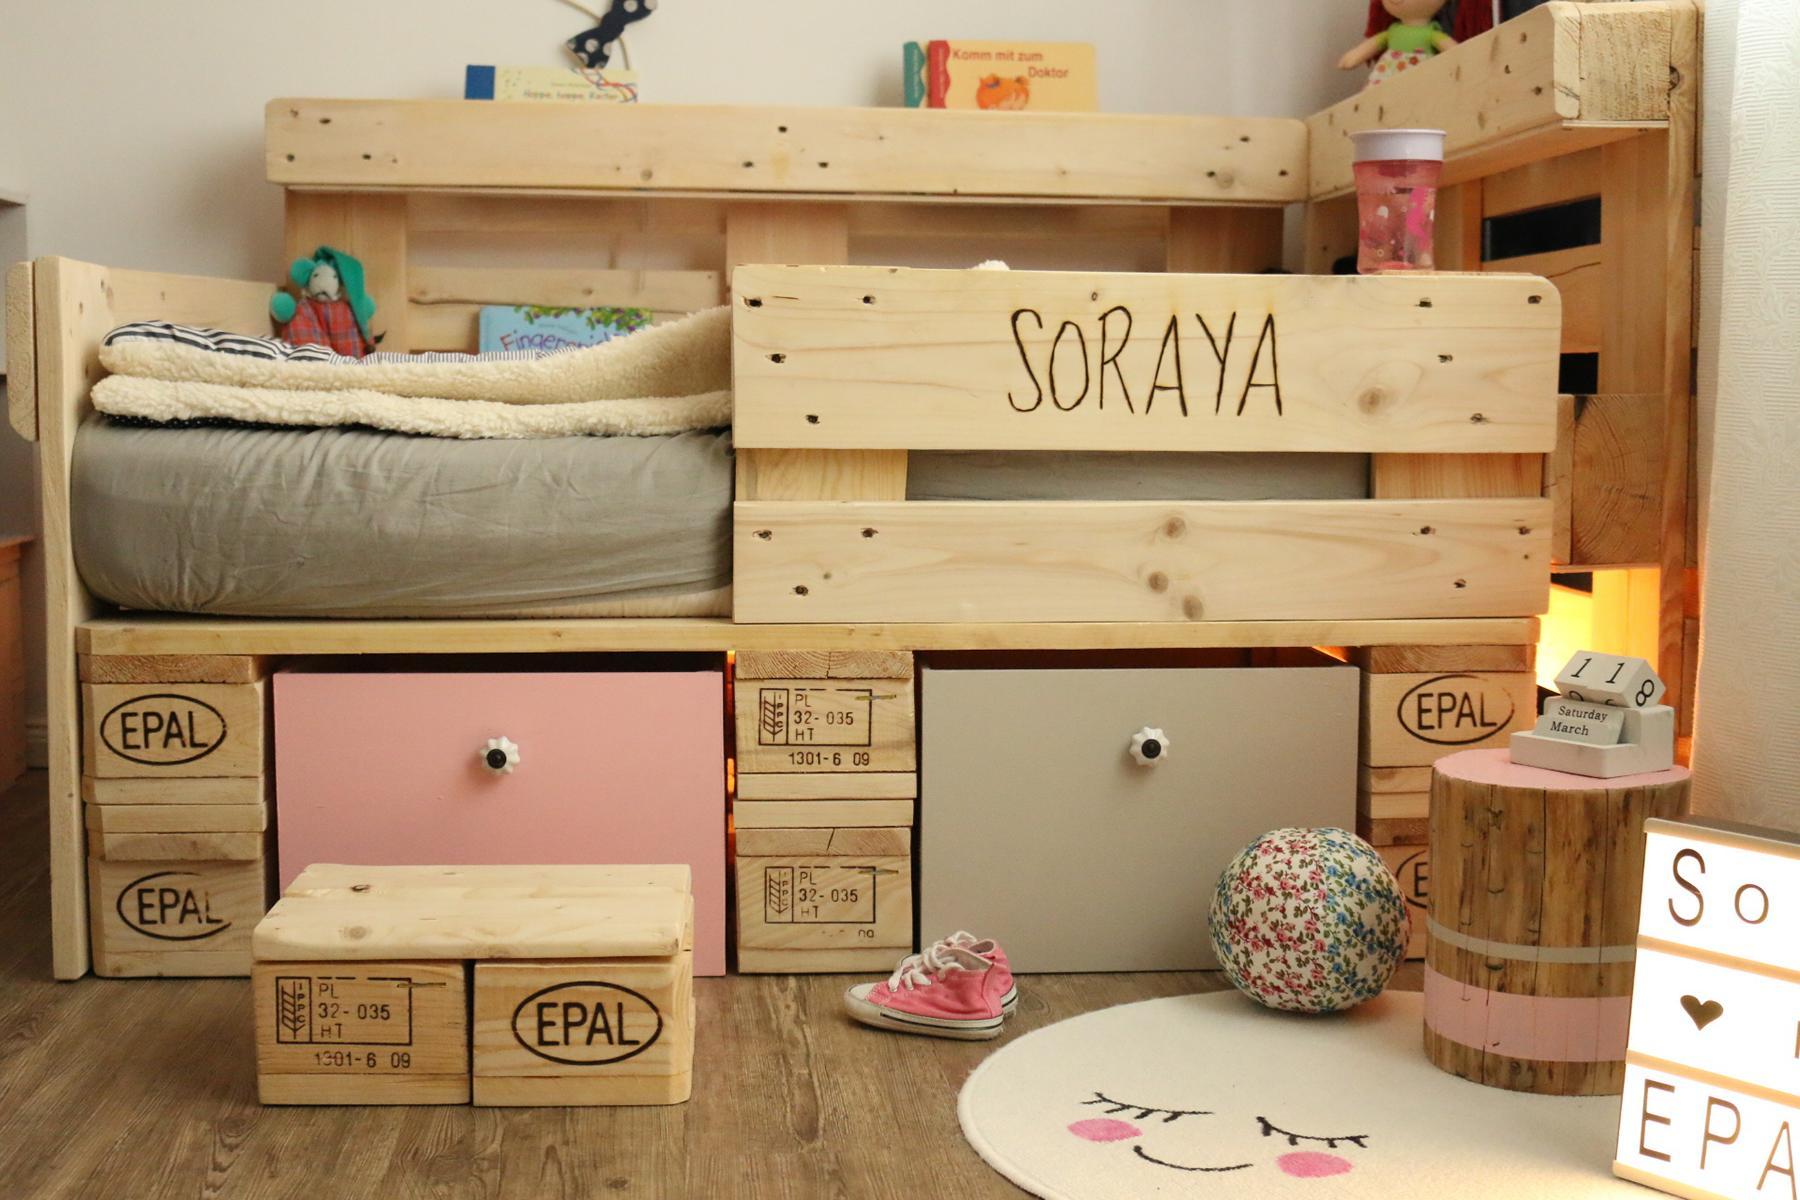 Full Size of Kinderbett Diy Rausfallschutz Bett Hausbett Ideen Ikea Kinderbetten Obi Wohnzimmer Kinderbett Diy